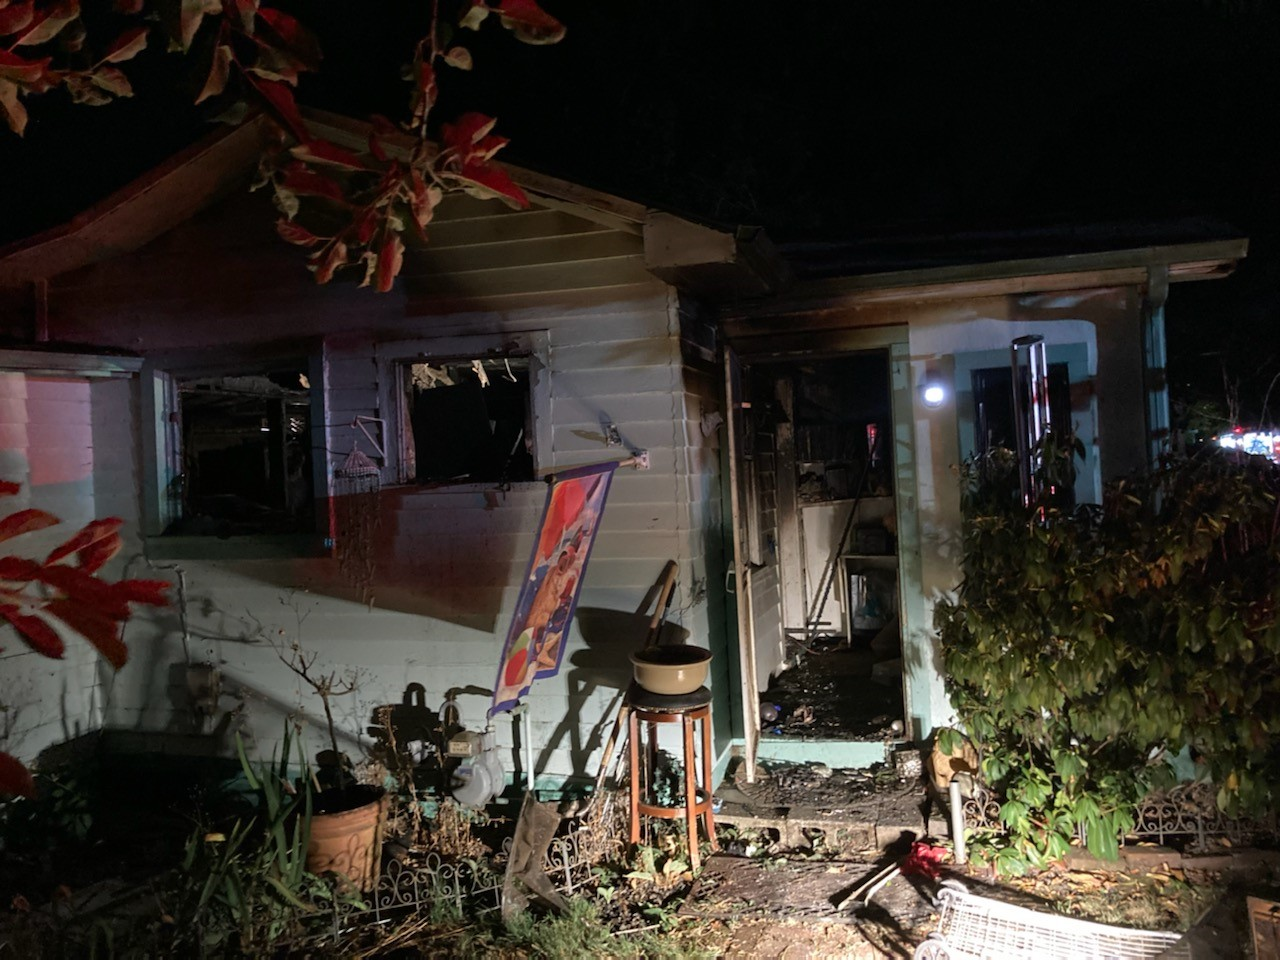 Woman, 2 dogs die in SE Portland house fire | KOIN.com